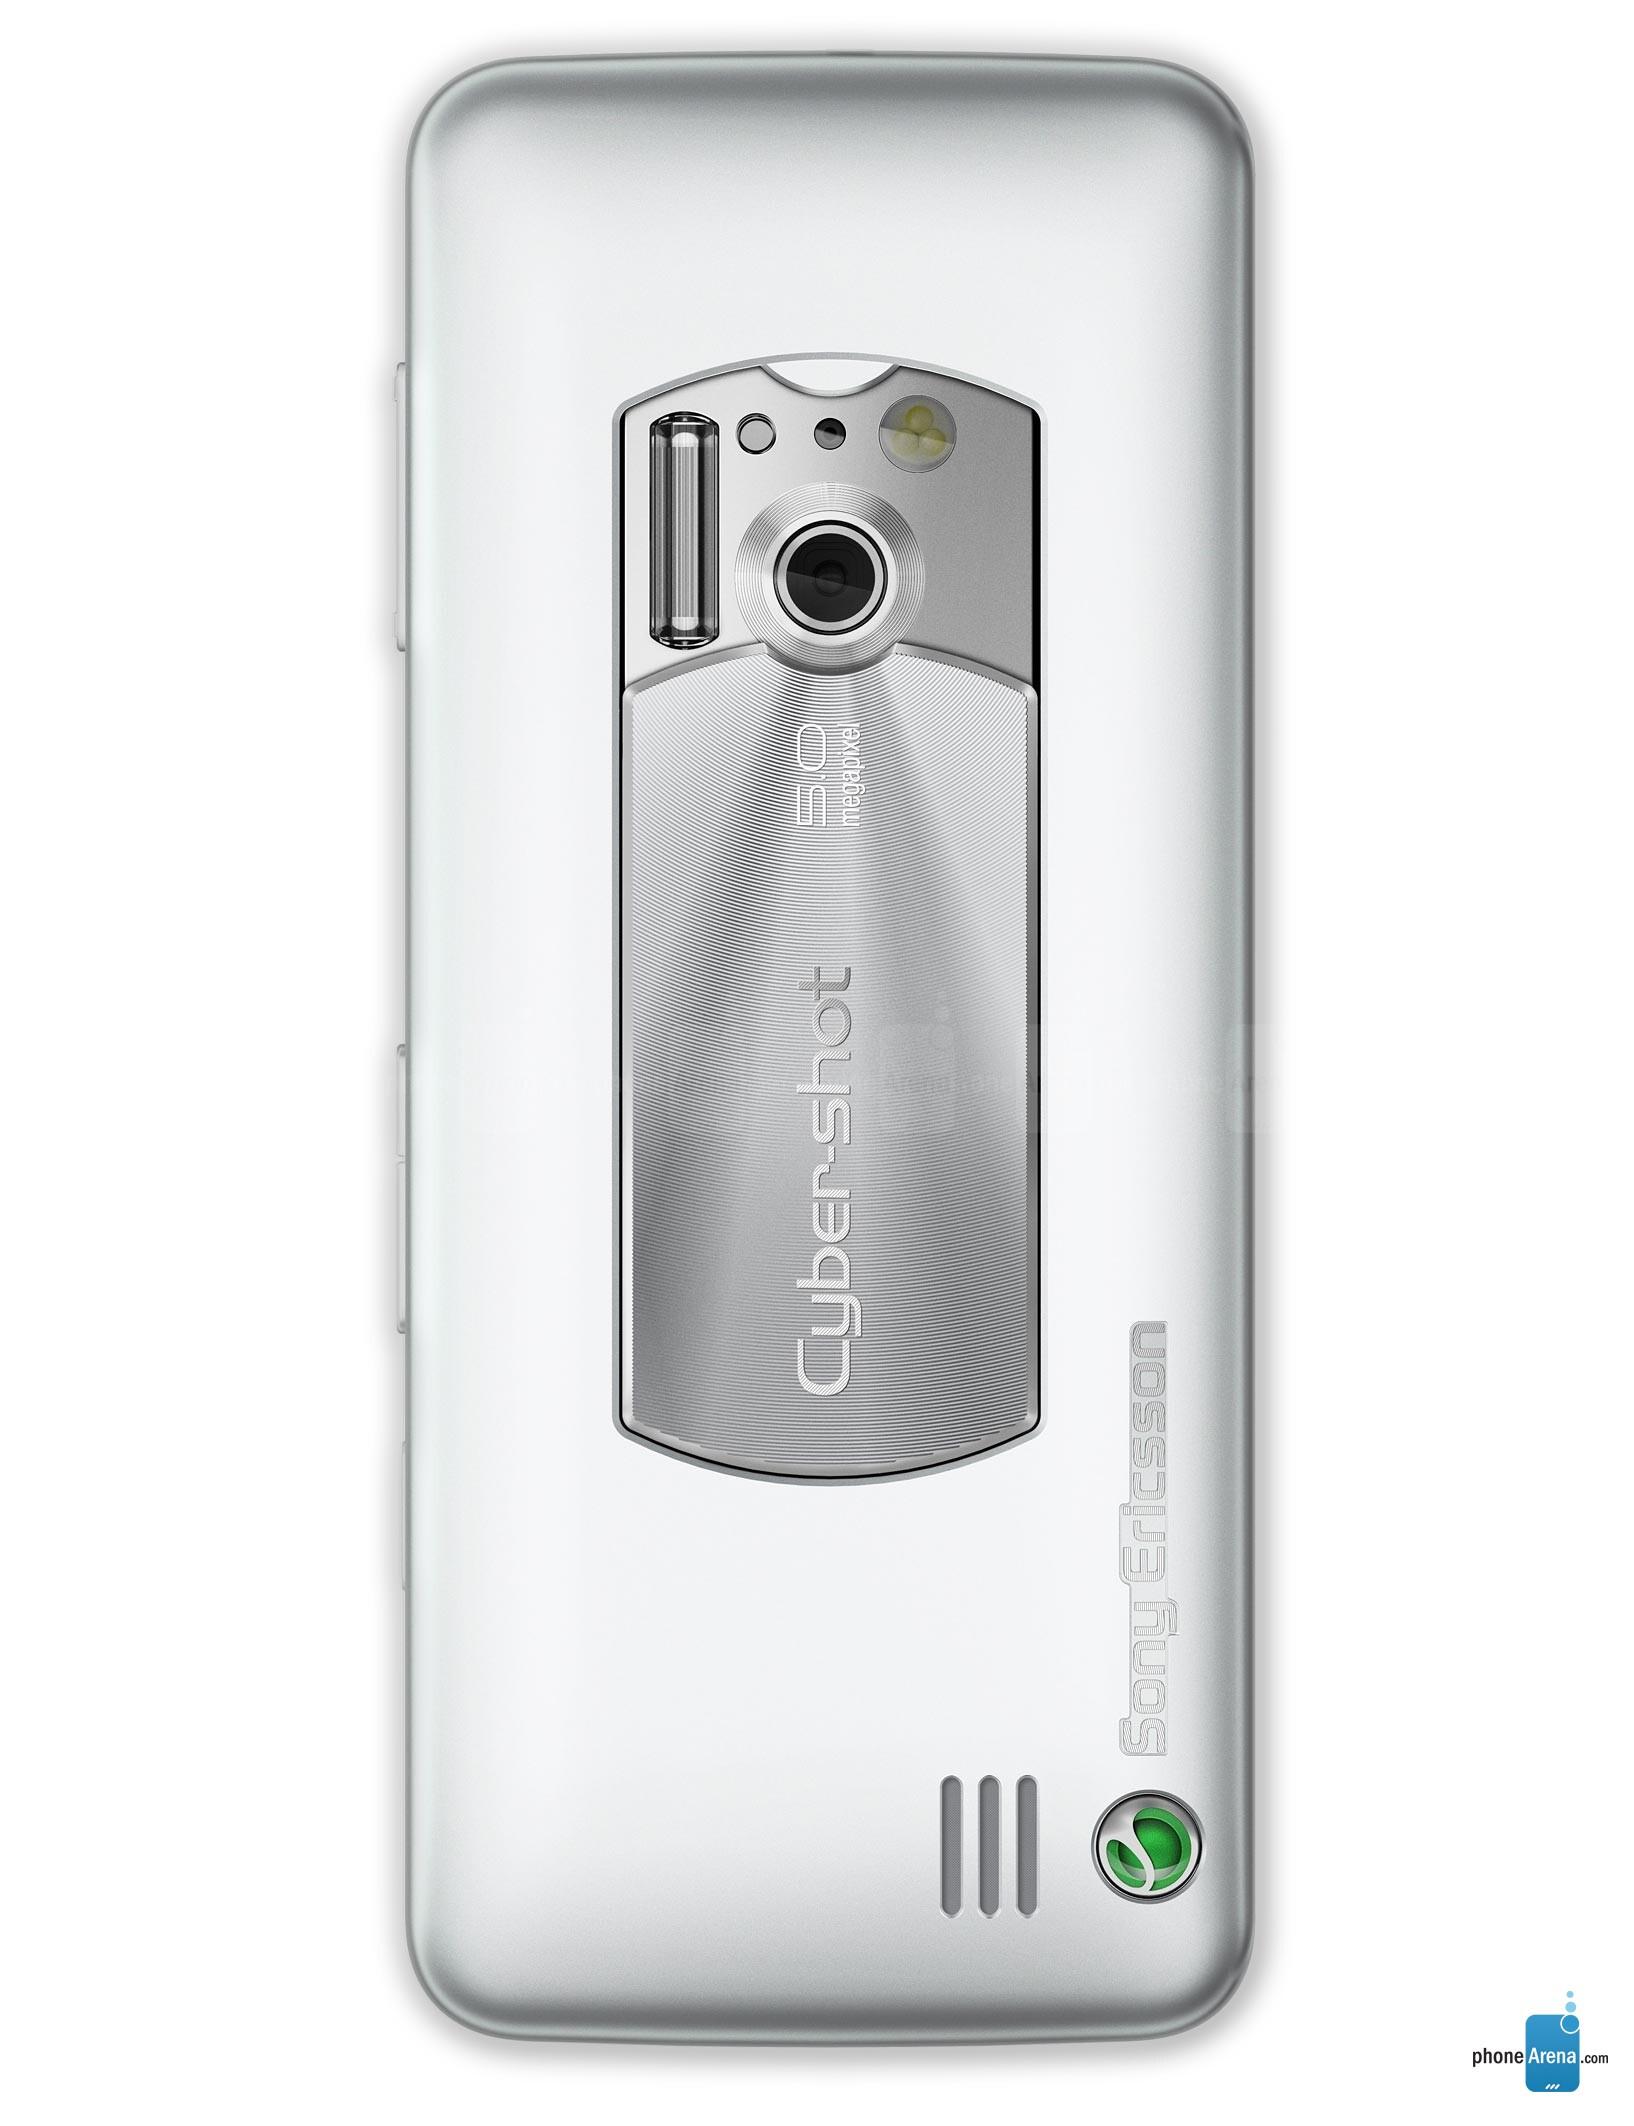 Sony Ericsson C901 GreenHeart full specs